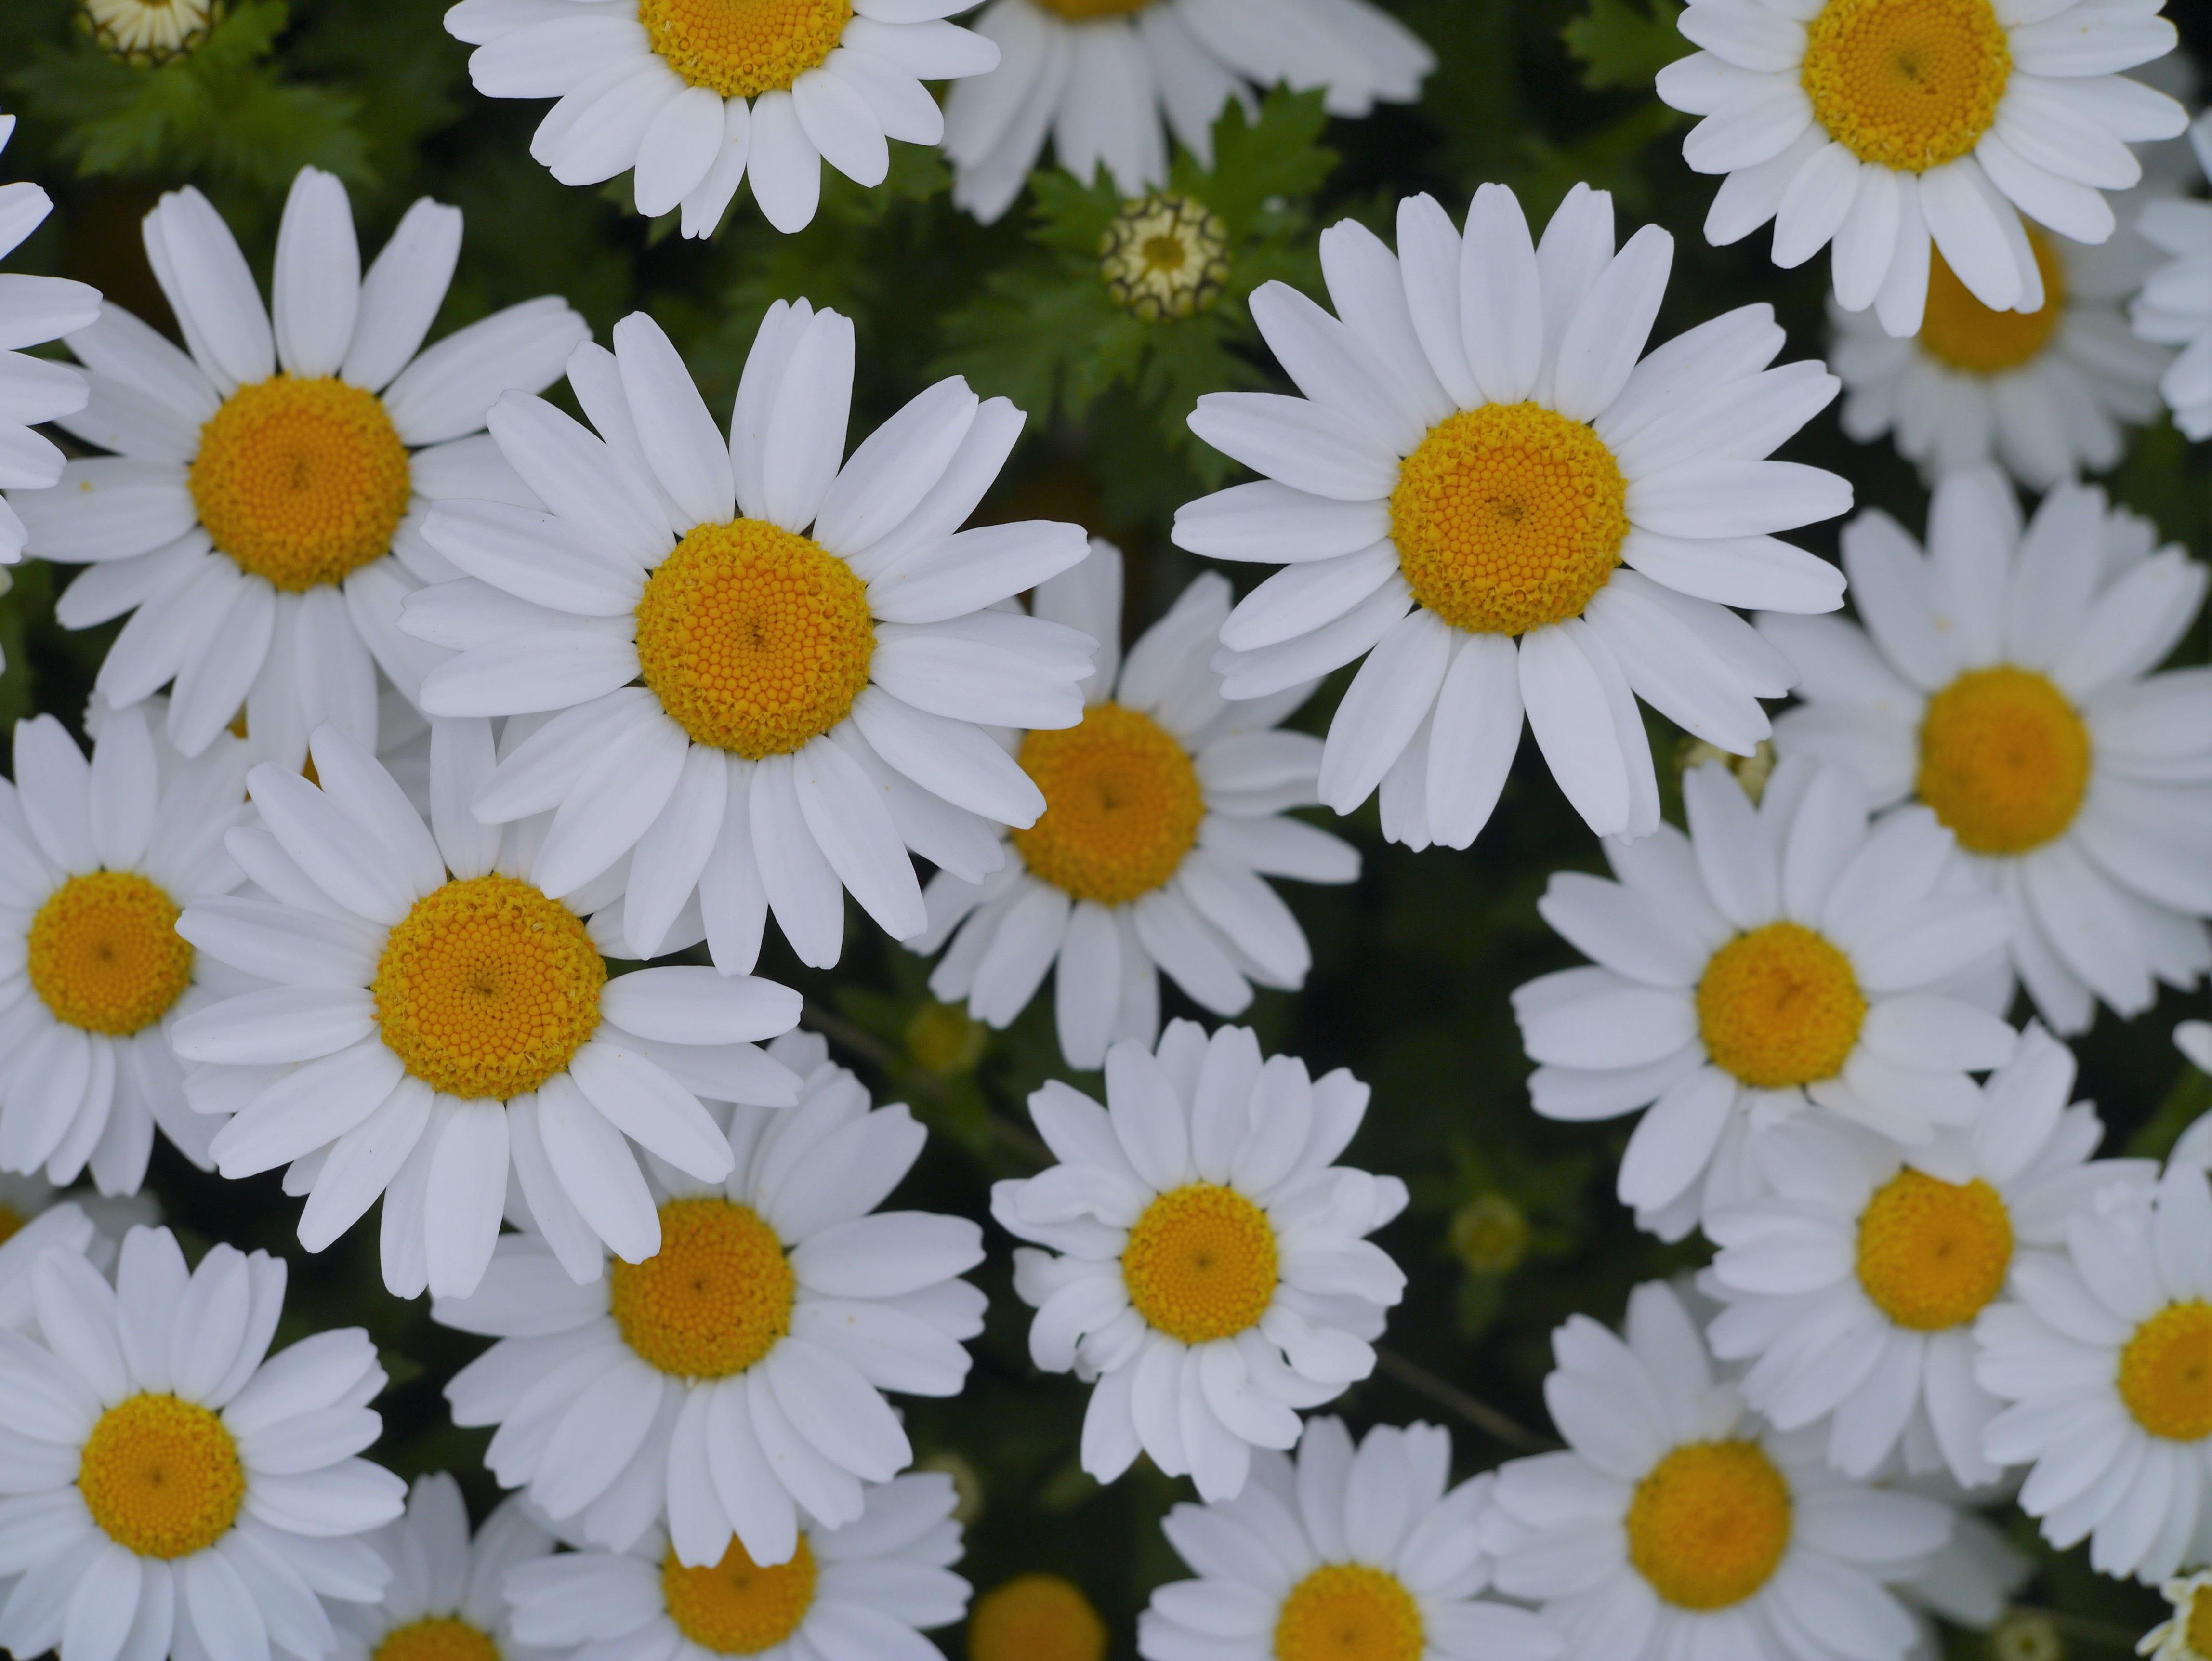 Gambar Menanam Daun Bunga Imut Bunga Aster Wanita Aroma Hijau Herba Kecil Kuning Jepang Flora Bunga Bunga Hamparan Bunga Benang Sari Kanagawa April Cantik Krisan Taman Bunga Budidaya Bunga Banyak Keharuman Margaret